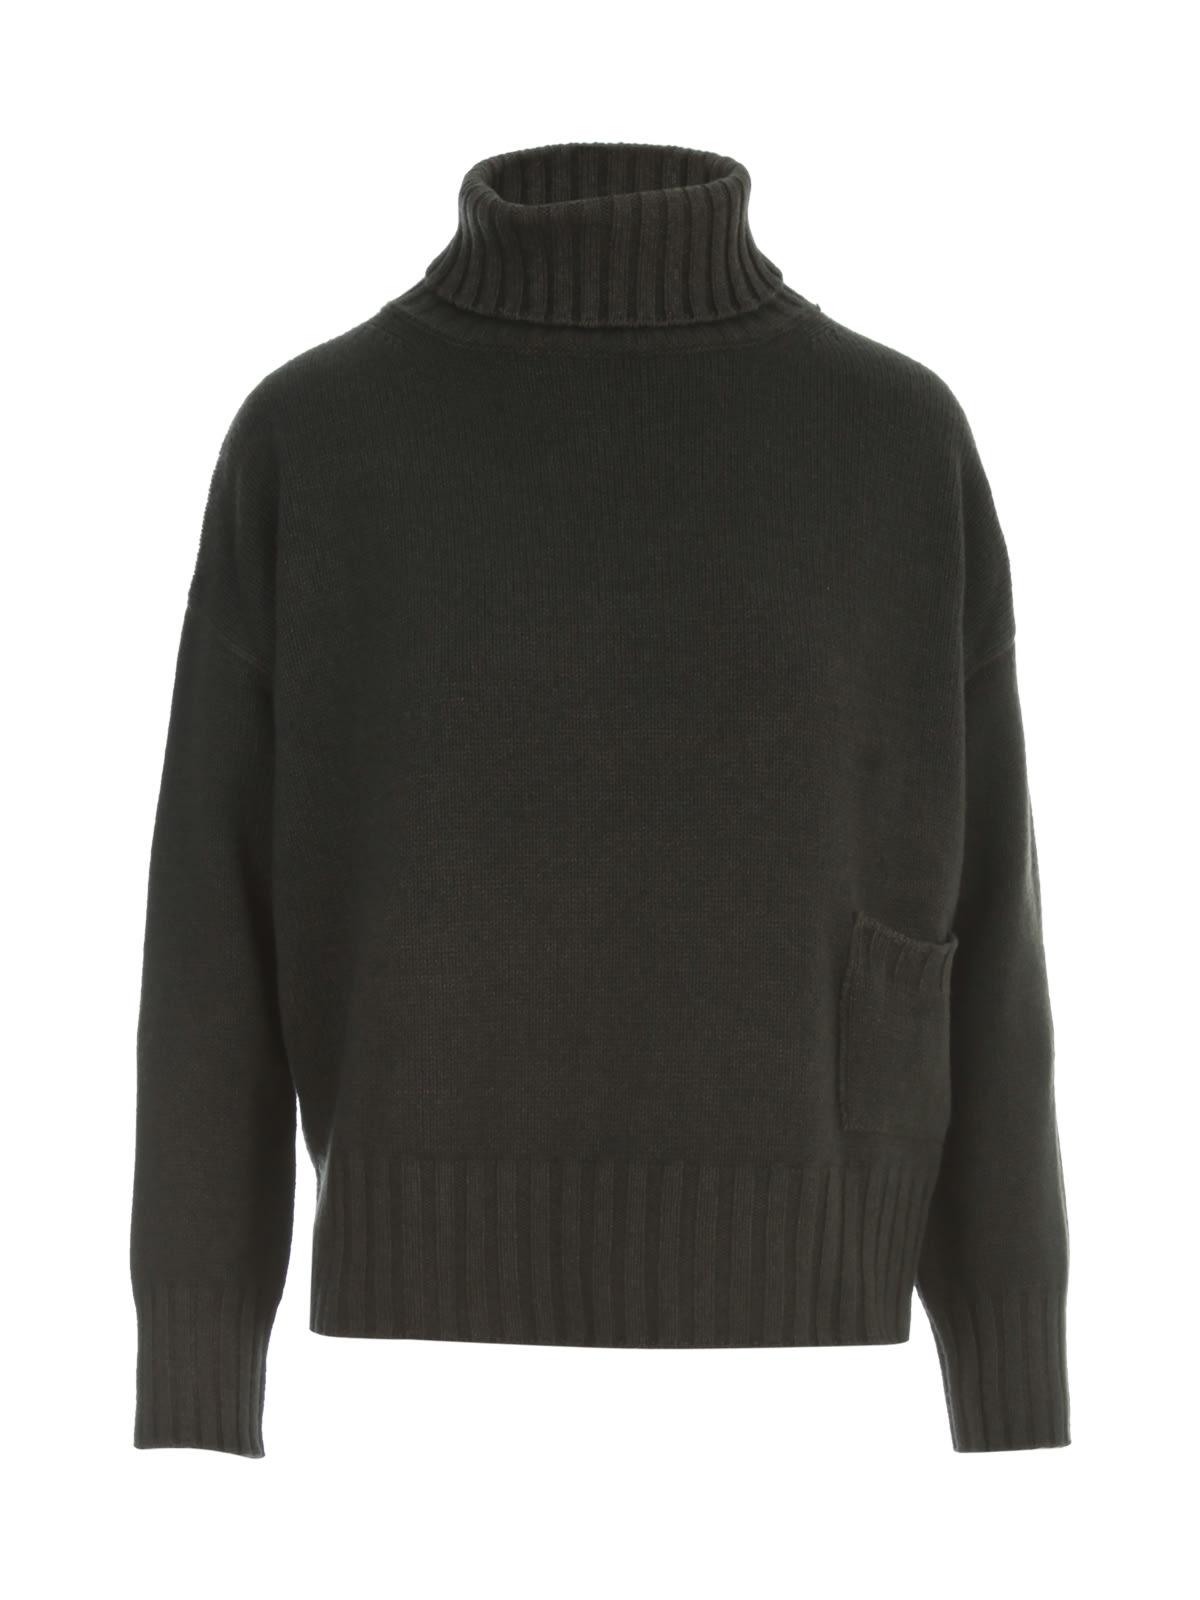 Oversized Turtle Neck Sweater W/pocket